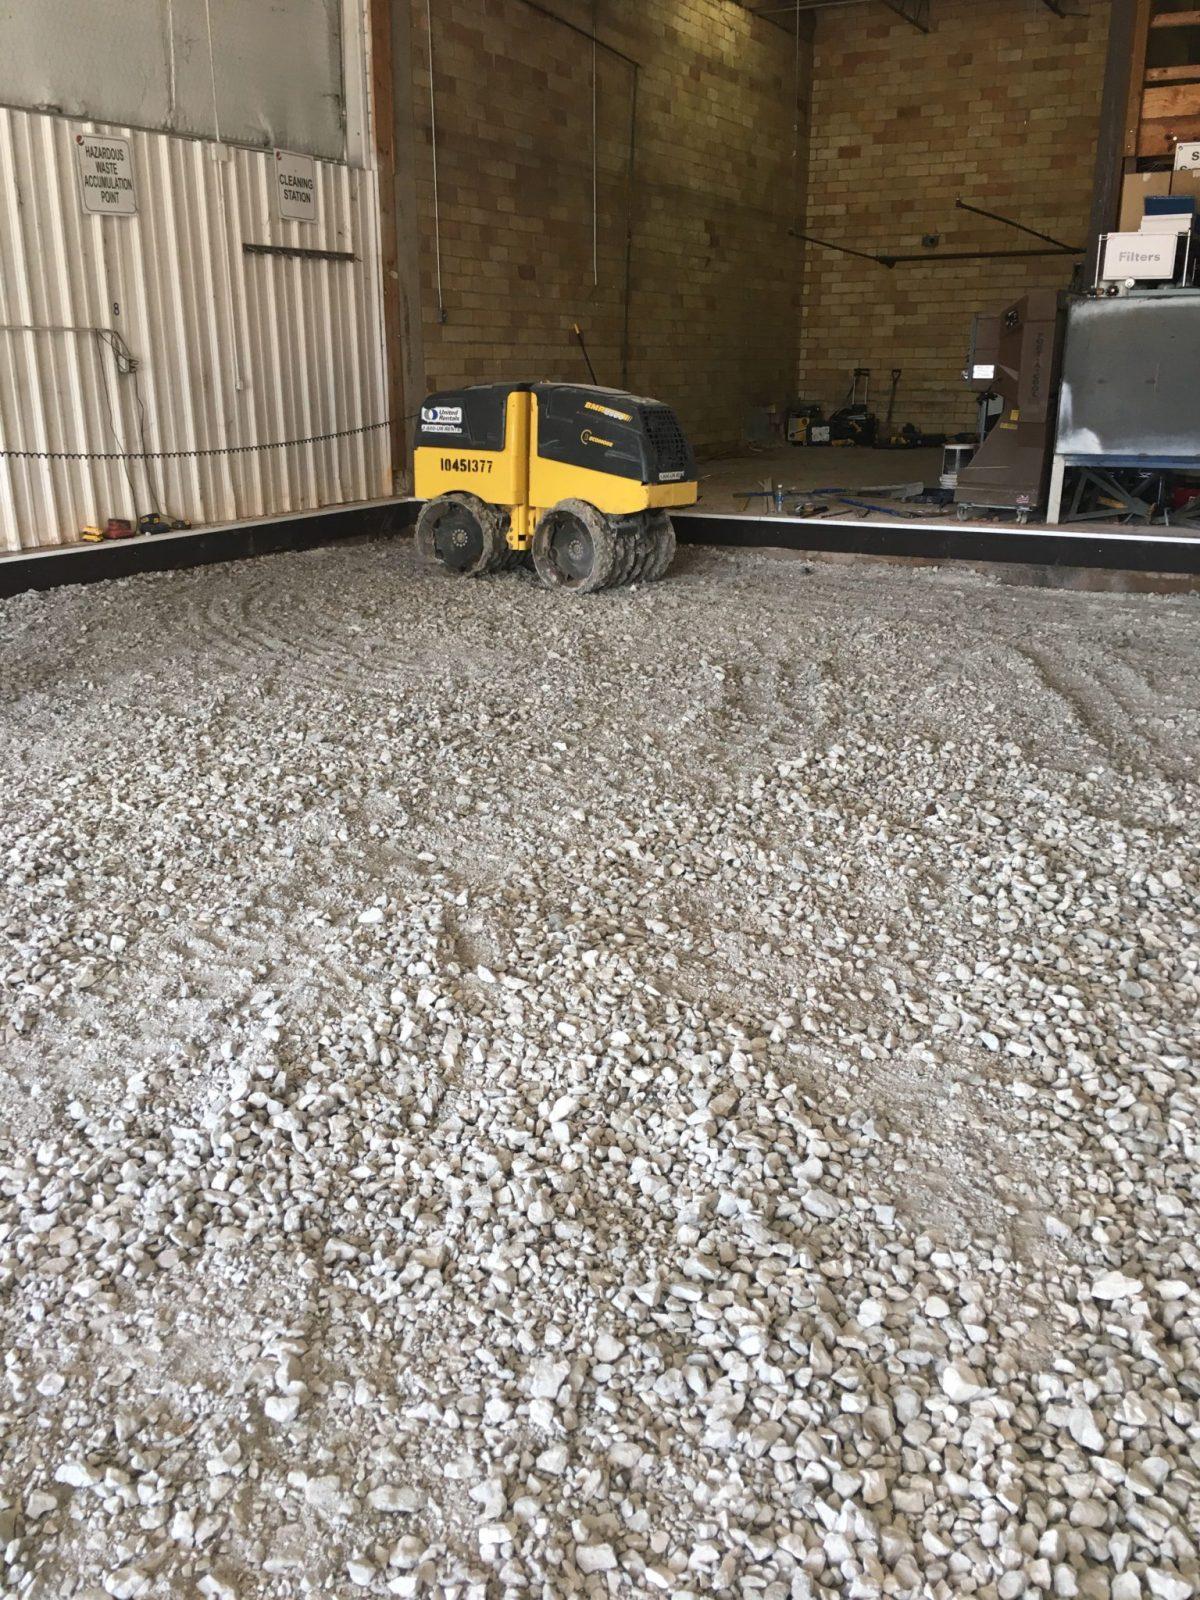 Concrete Backfill Compacting